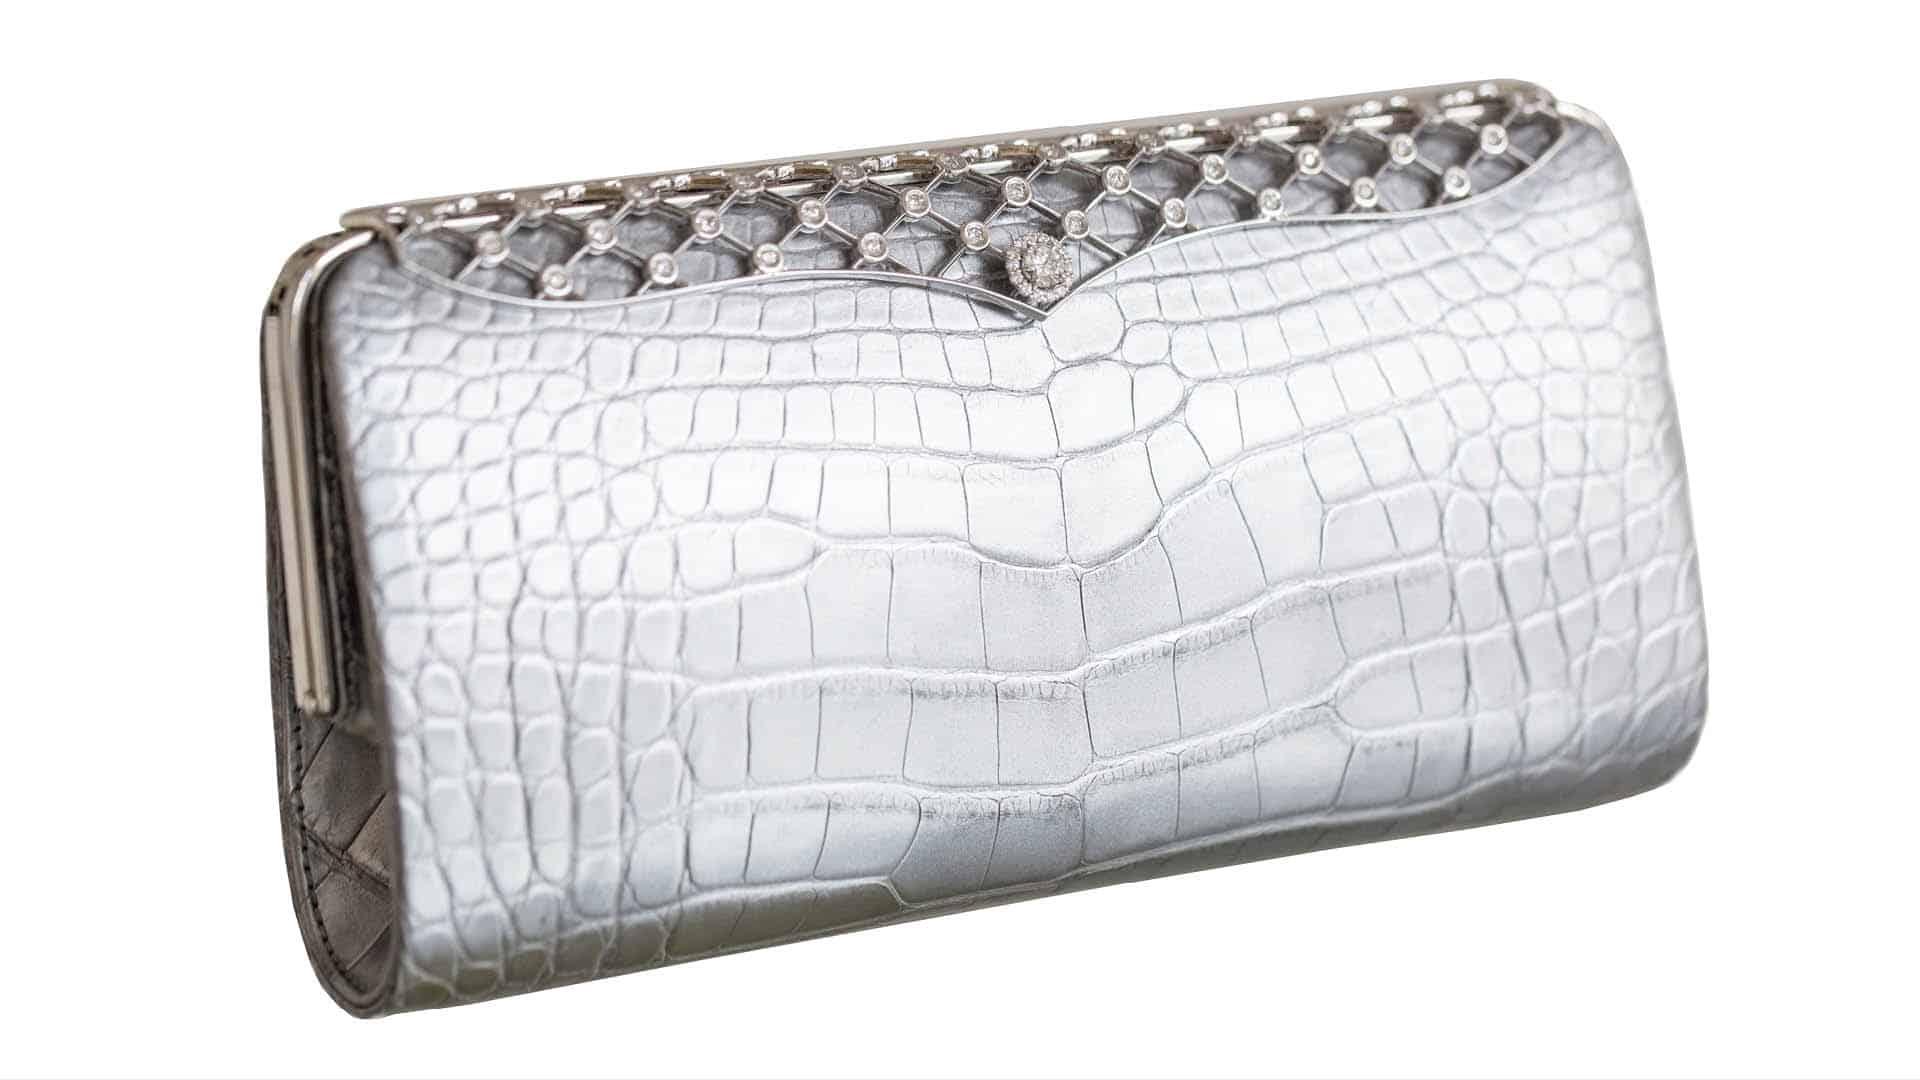 The most expensive handbag brands - Lana Marks